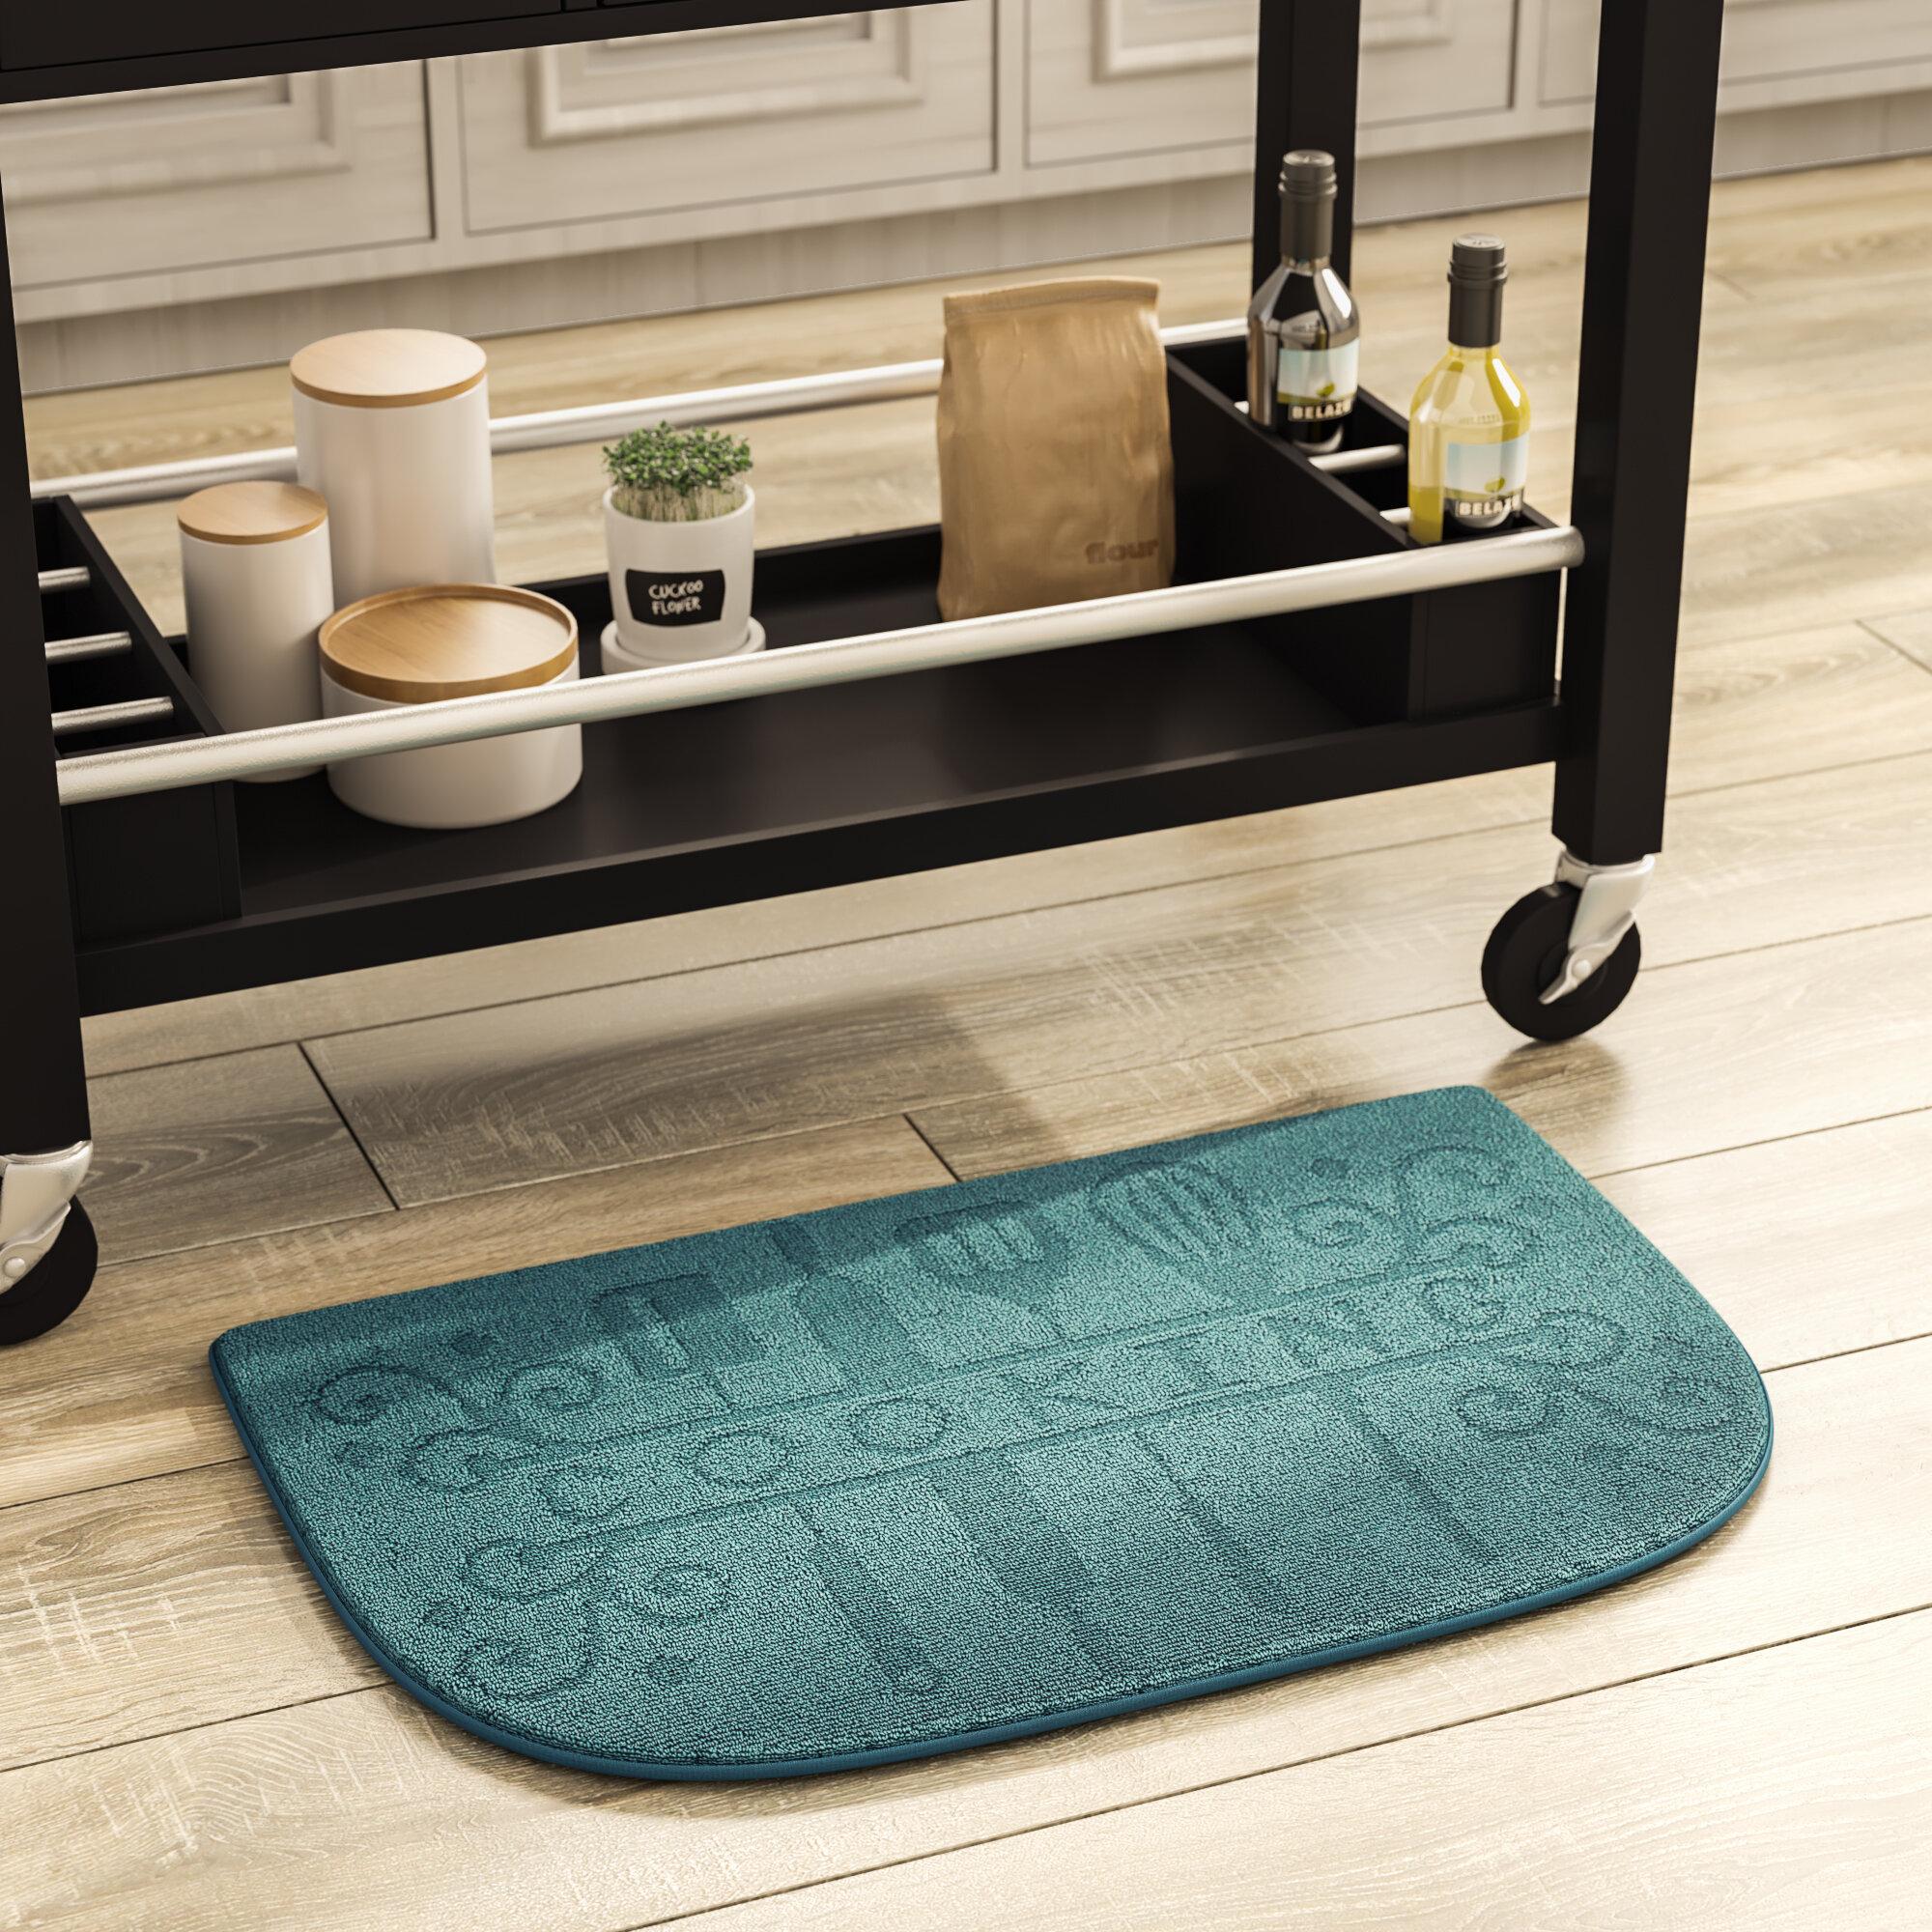 2 Pcs = 21/'/' x 42/'/' Kitchen Mat Cushion Comfort Chefs Foam Anti-Fatigue .